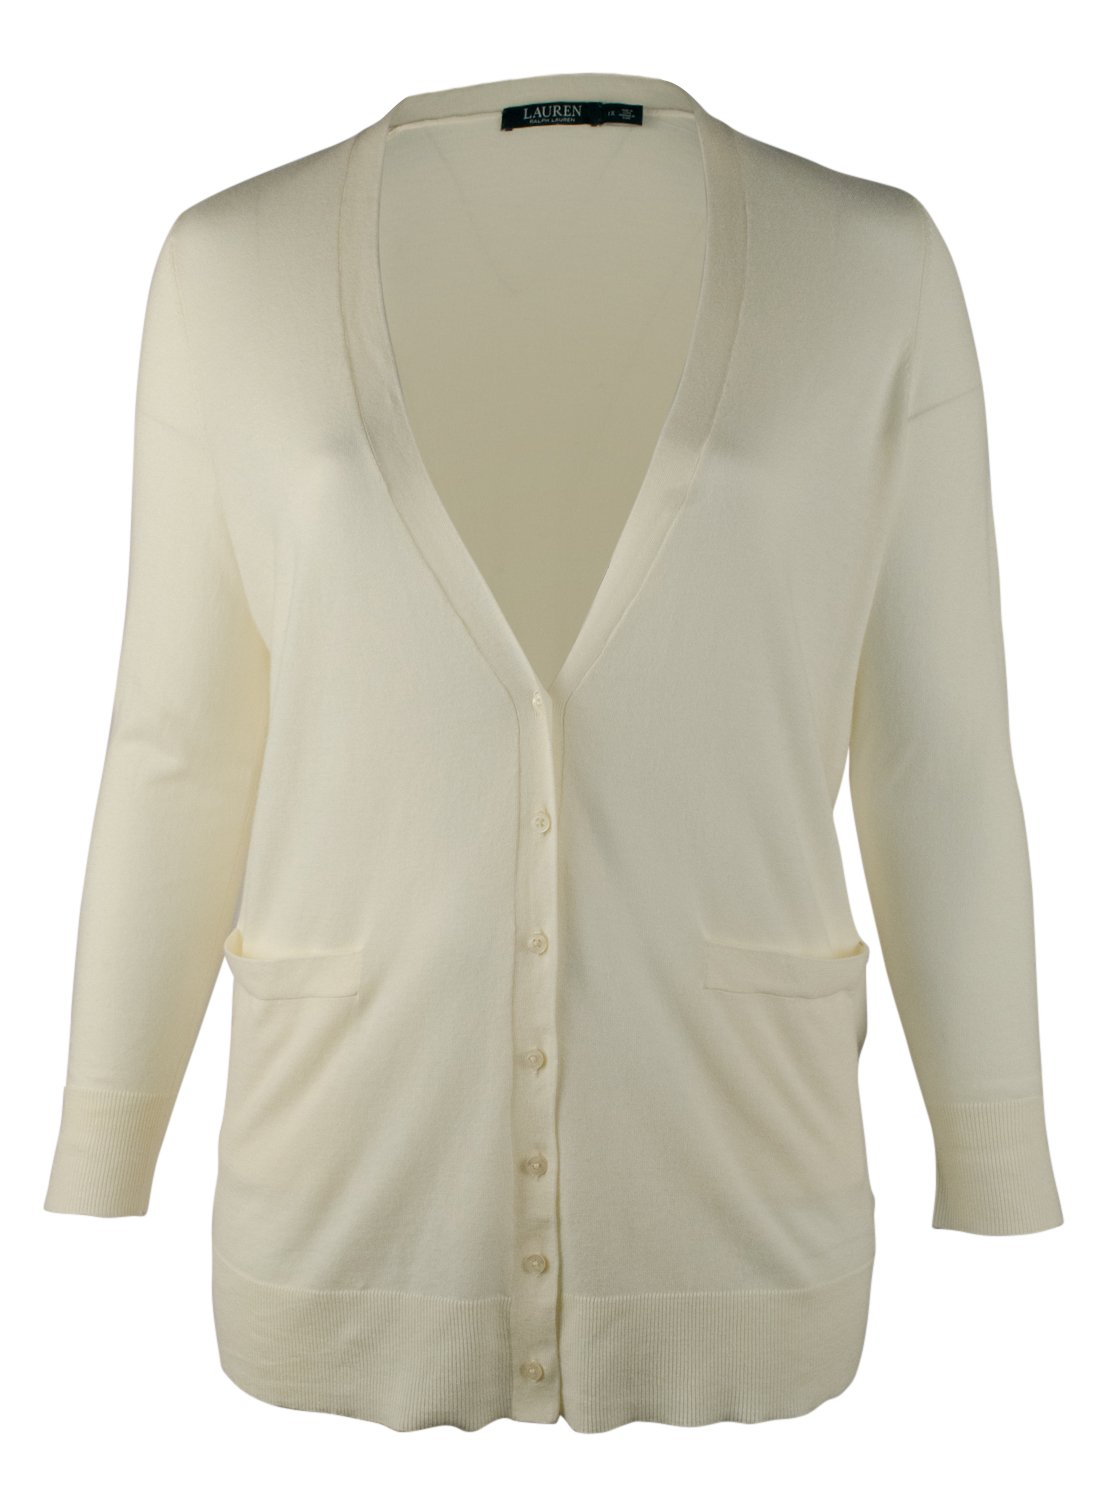 Lauren Ralph Lauren Womens Plus Ribbed Trim Cardigan Top Ivory 1X